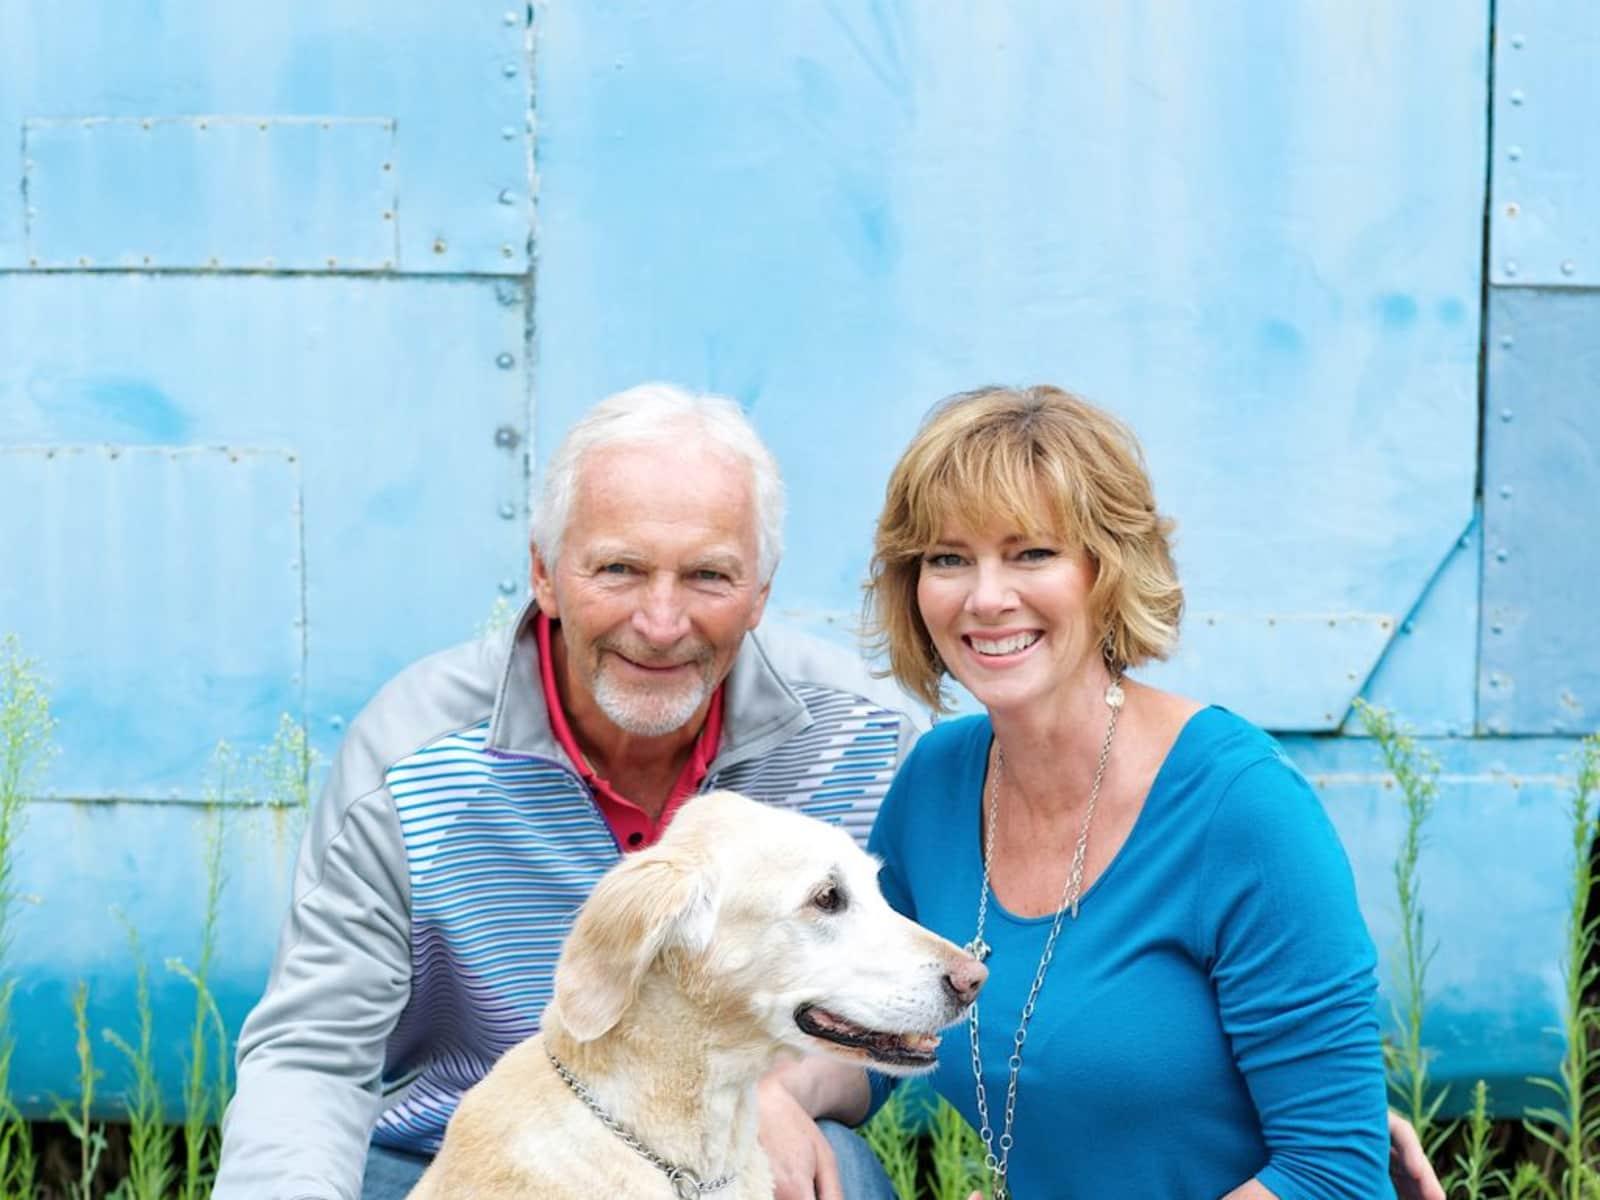 Ann & James from Kelowna, British Columbia, Canada